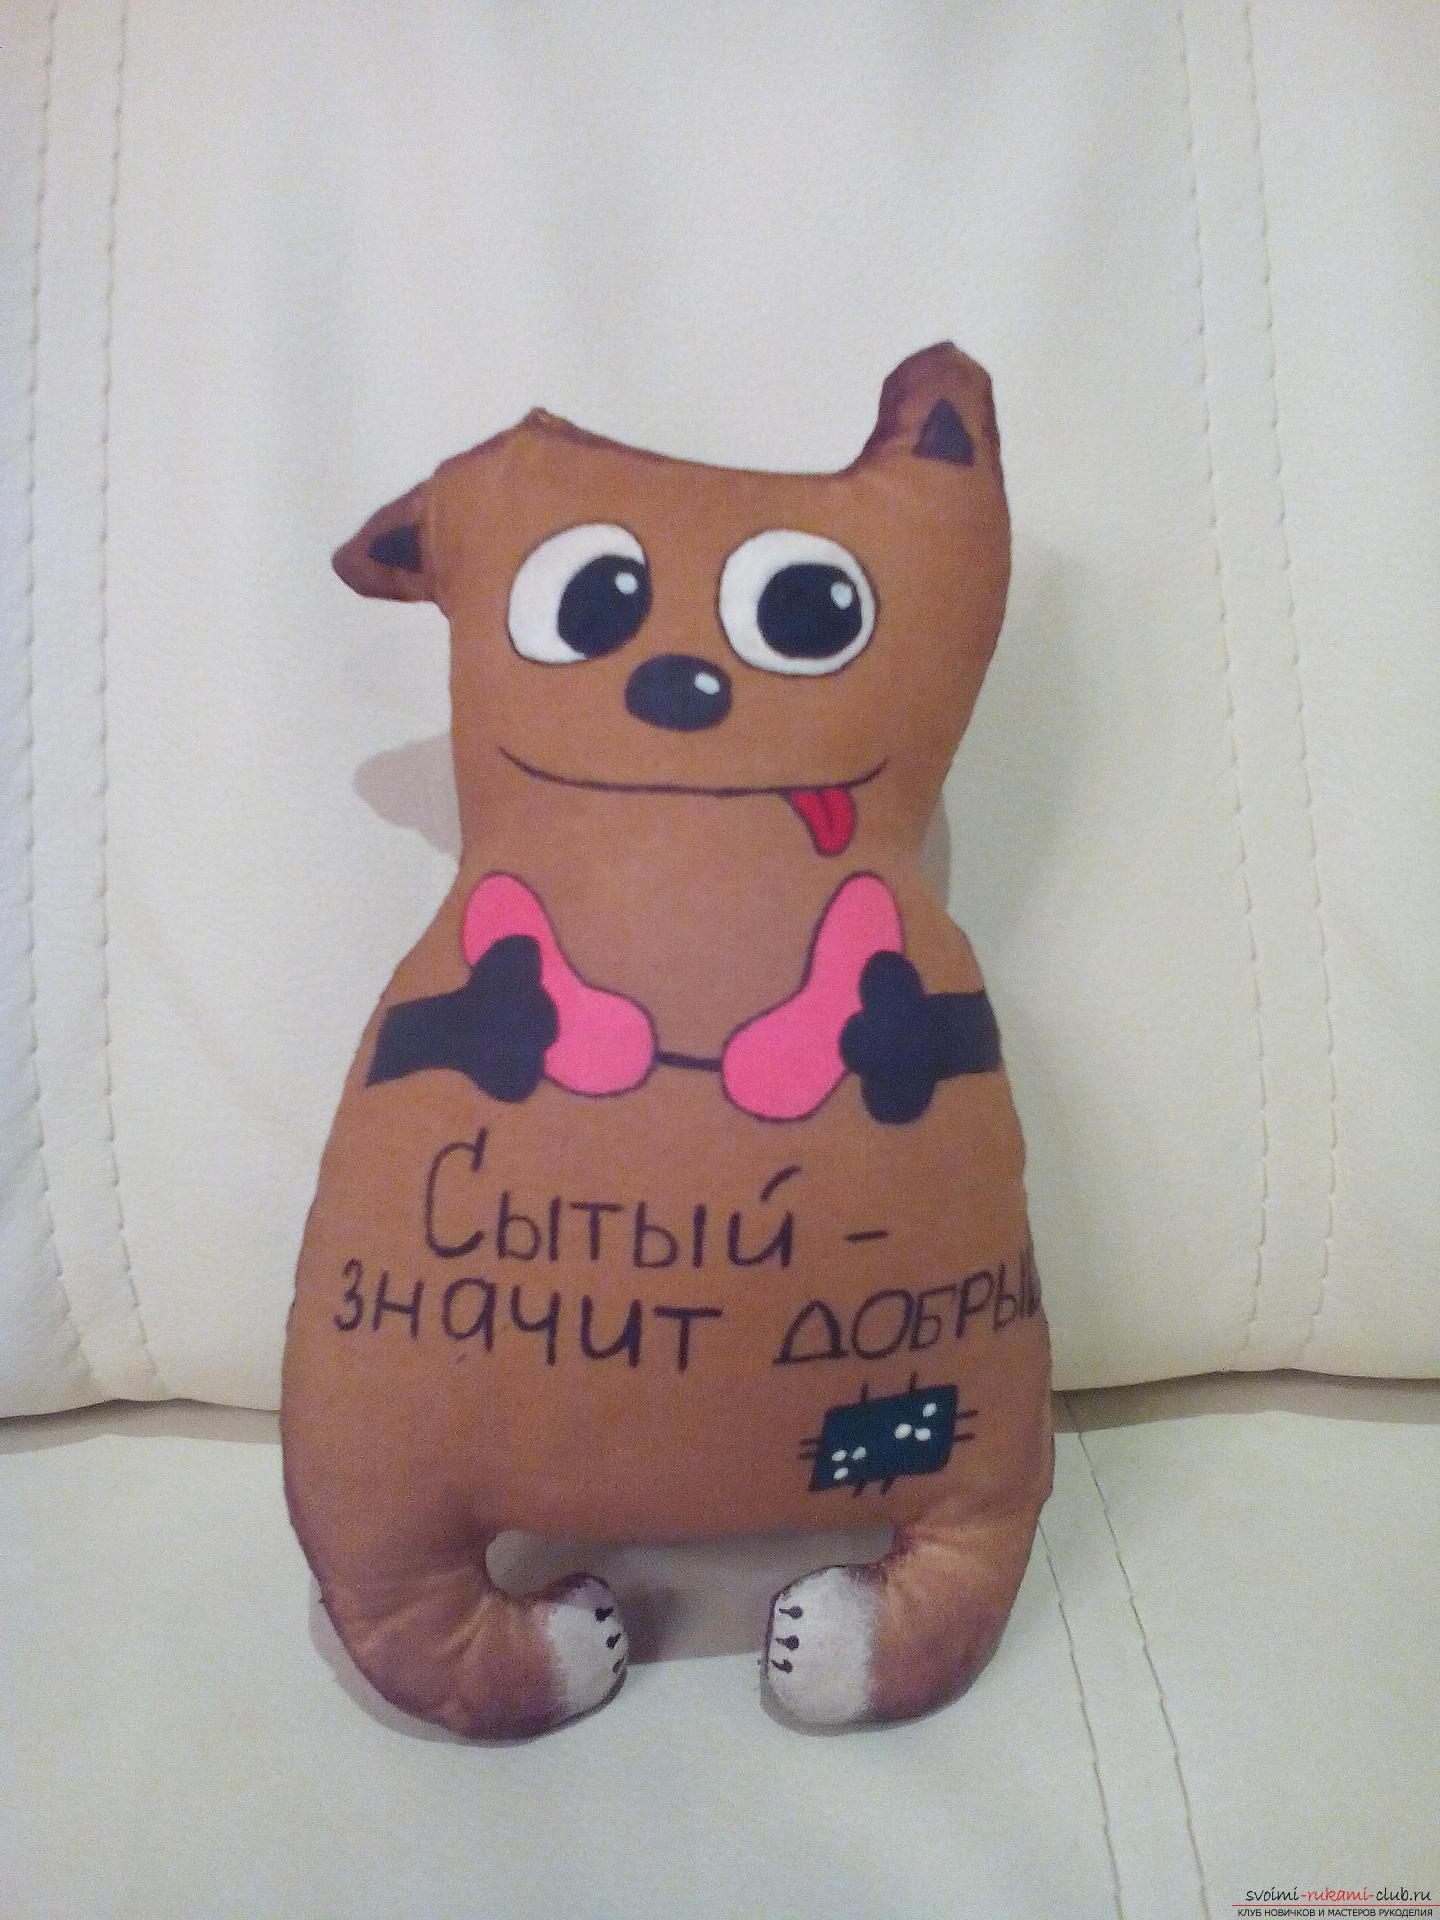 Этот мастер-класс содержит выкройку игрушки-примитива - мягкого кота Лакомки.. Фото №1